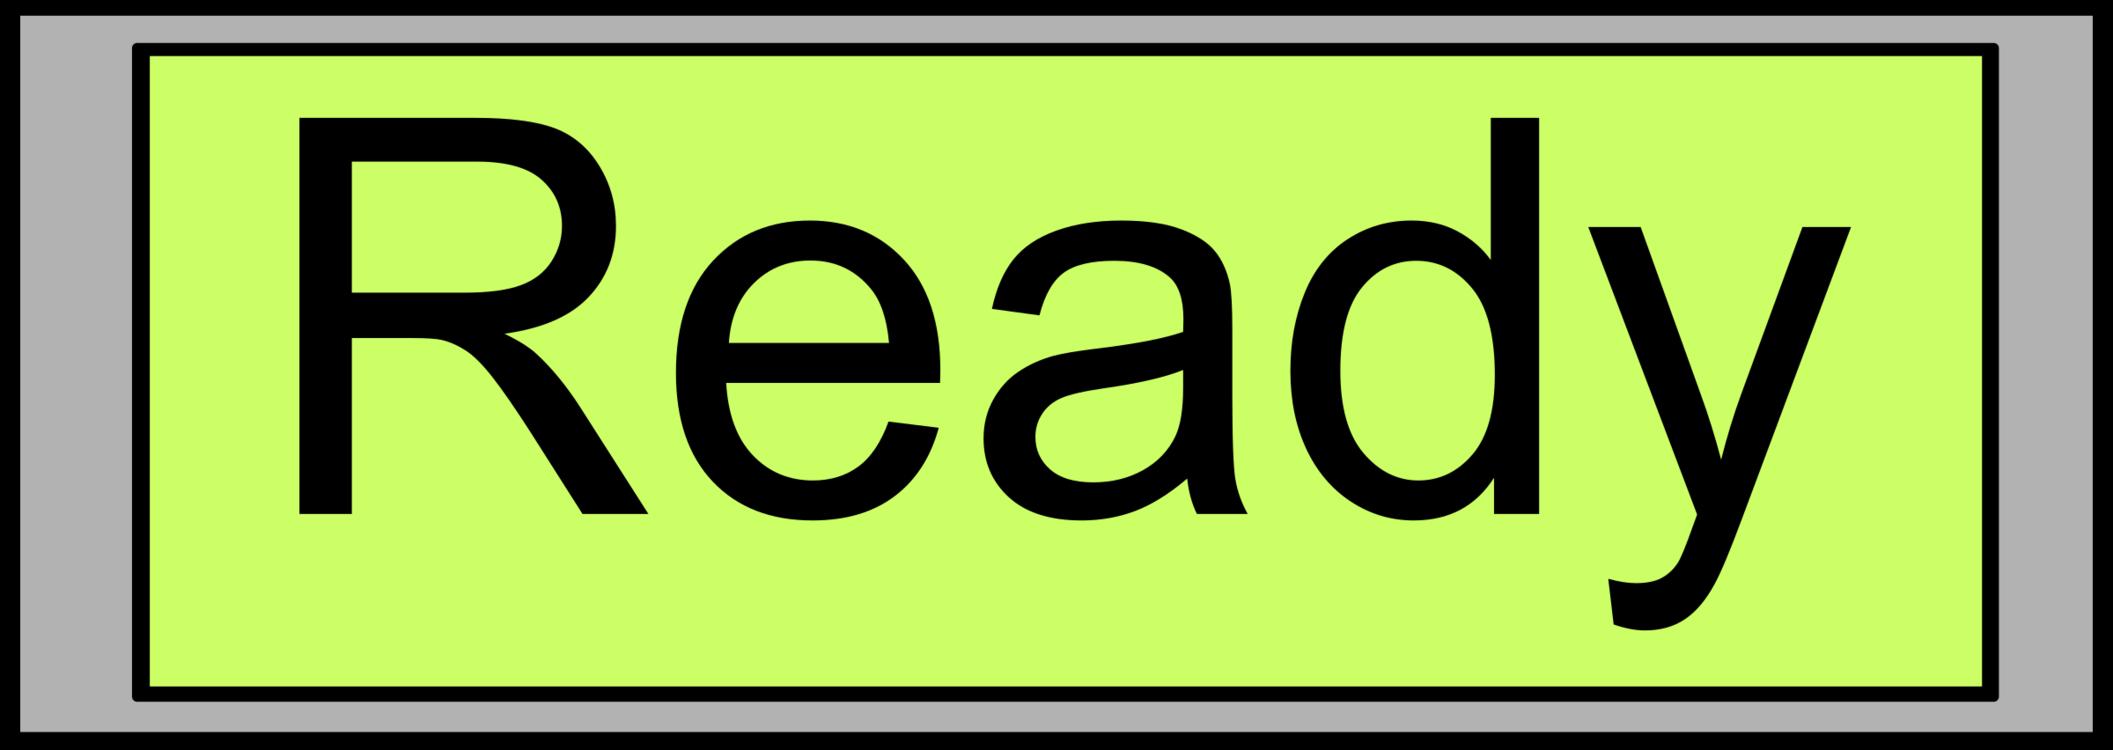 Grass,Area,Text